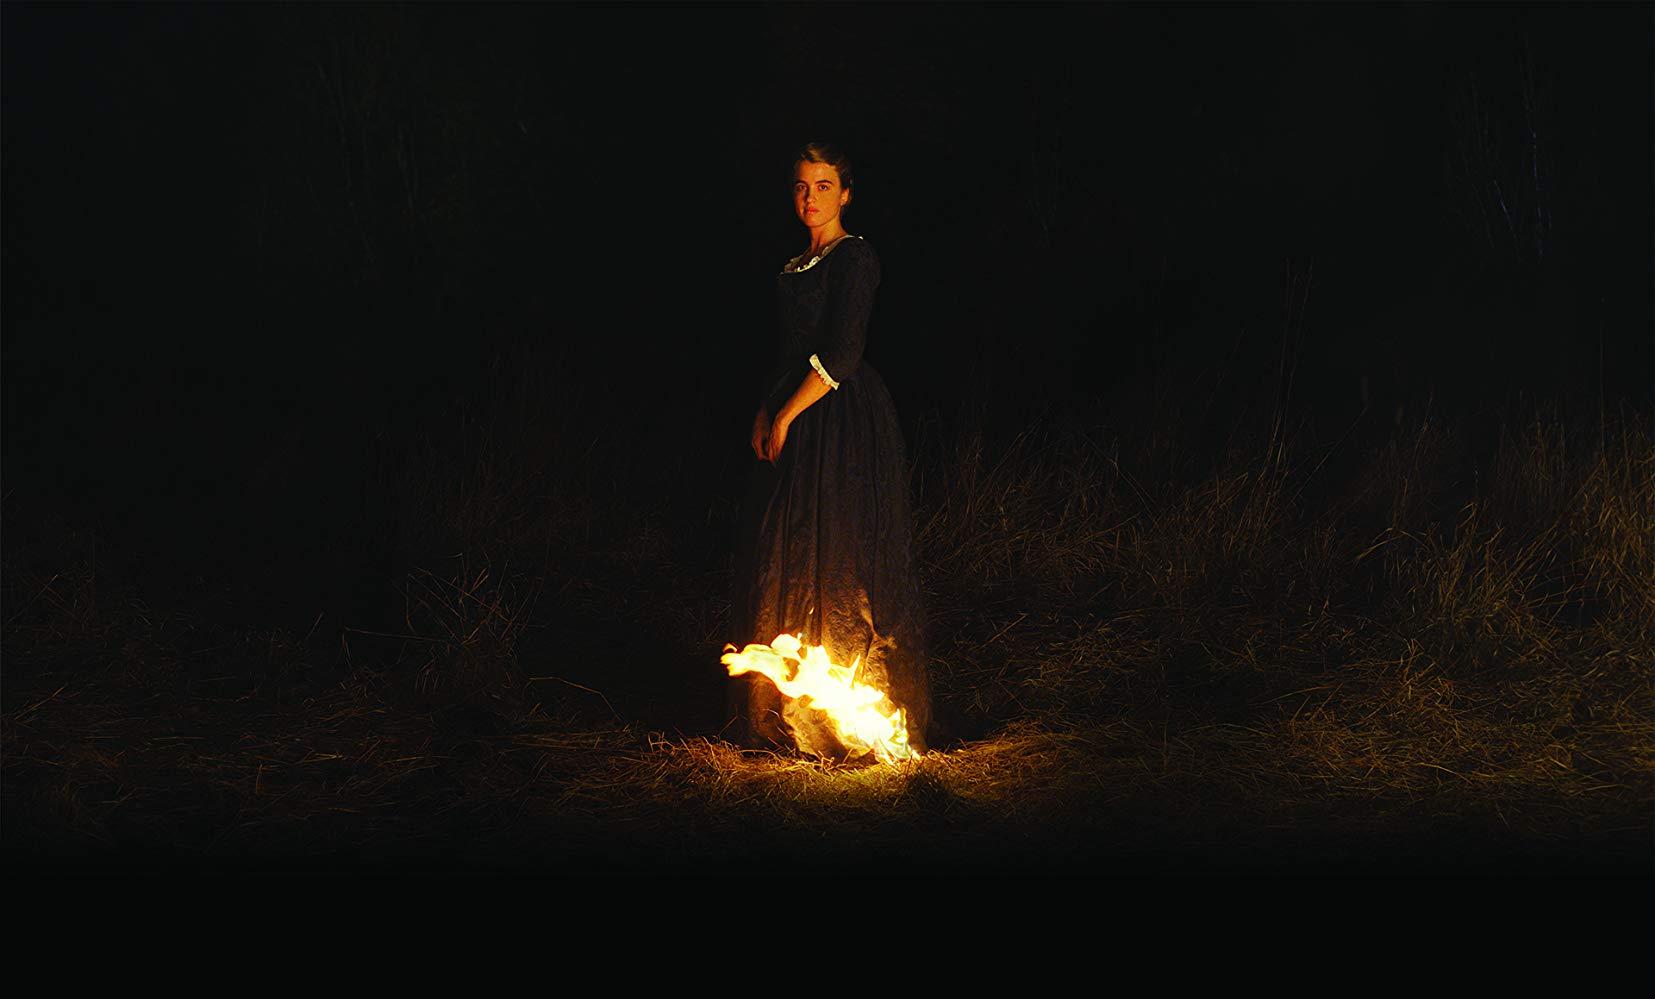 [Nightmarish Detour Review] PORTRAIT OF A LADY ON FIRE